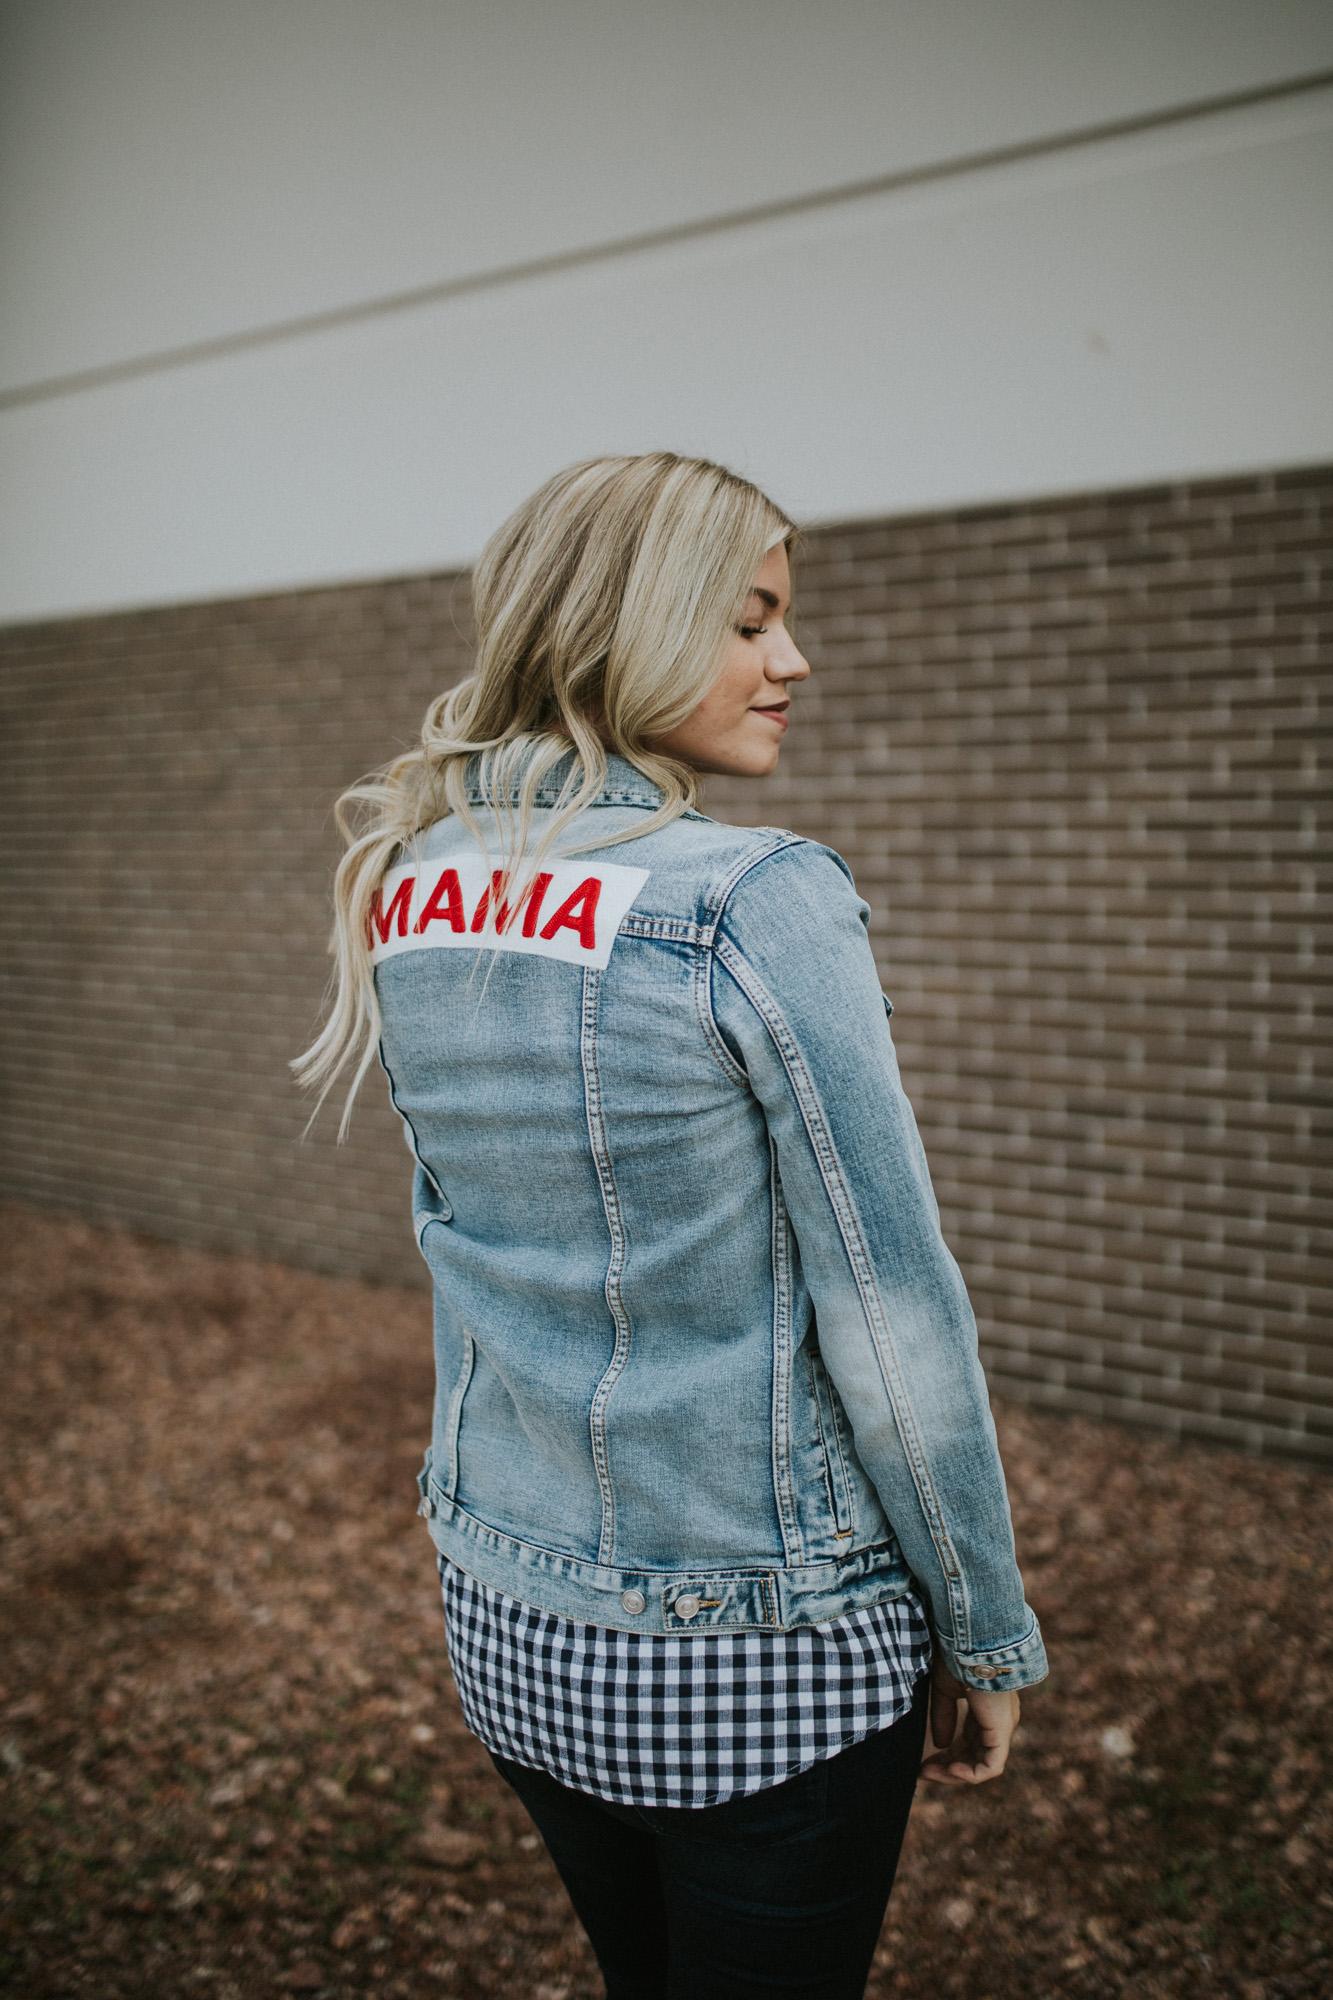 Mama Denim Jacket / Ingrid & Isabel Maternity • @livingincolorblog